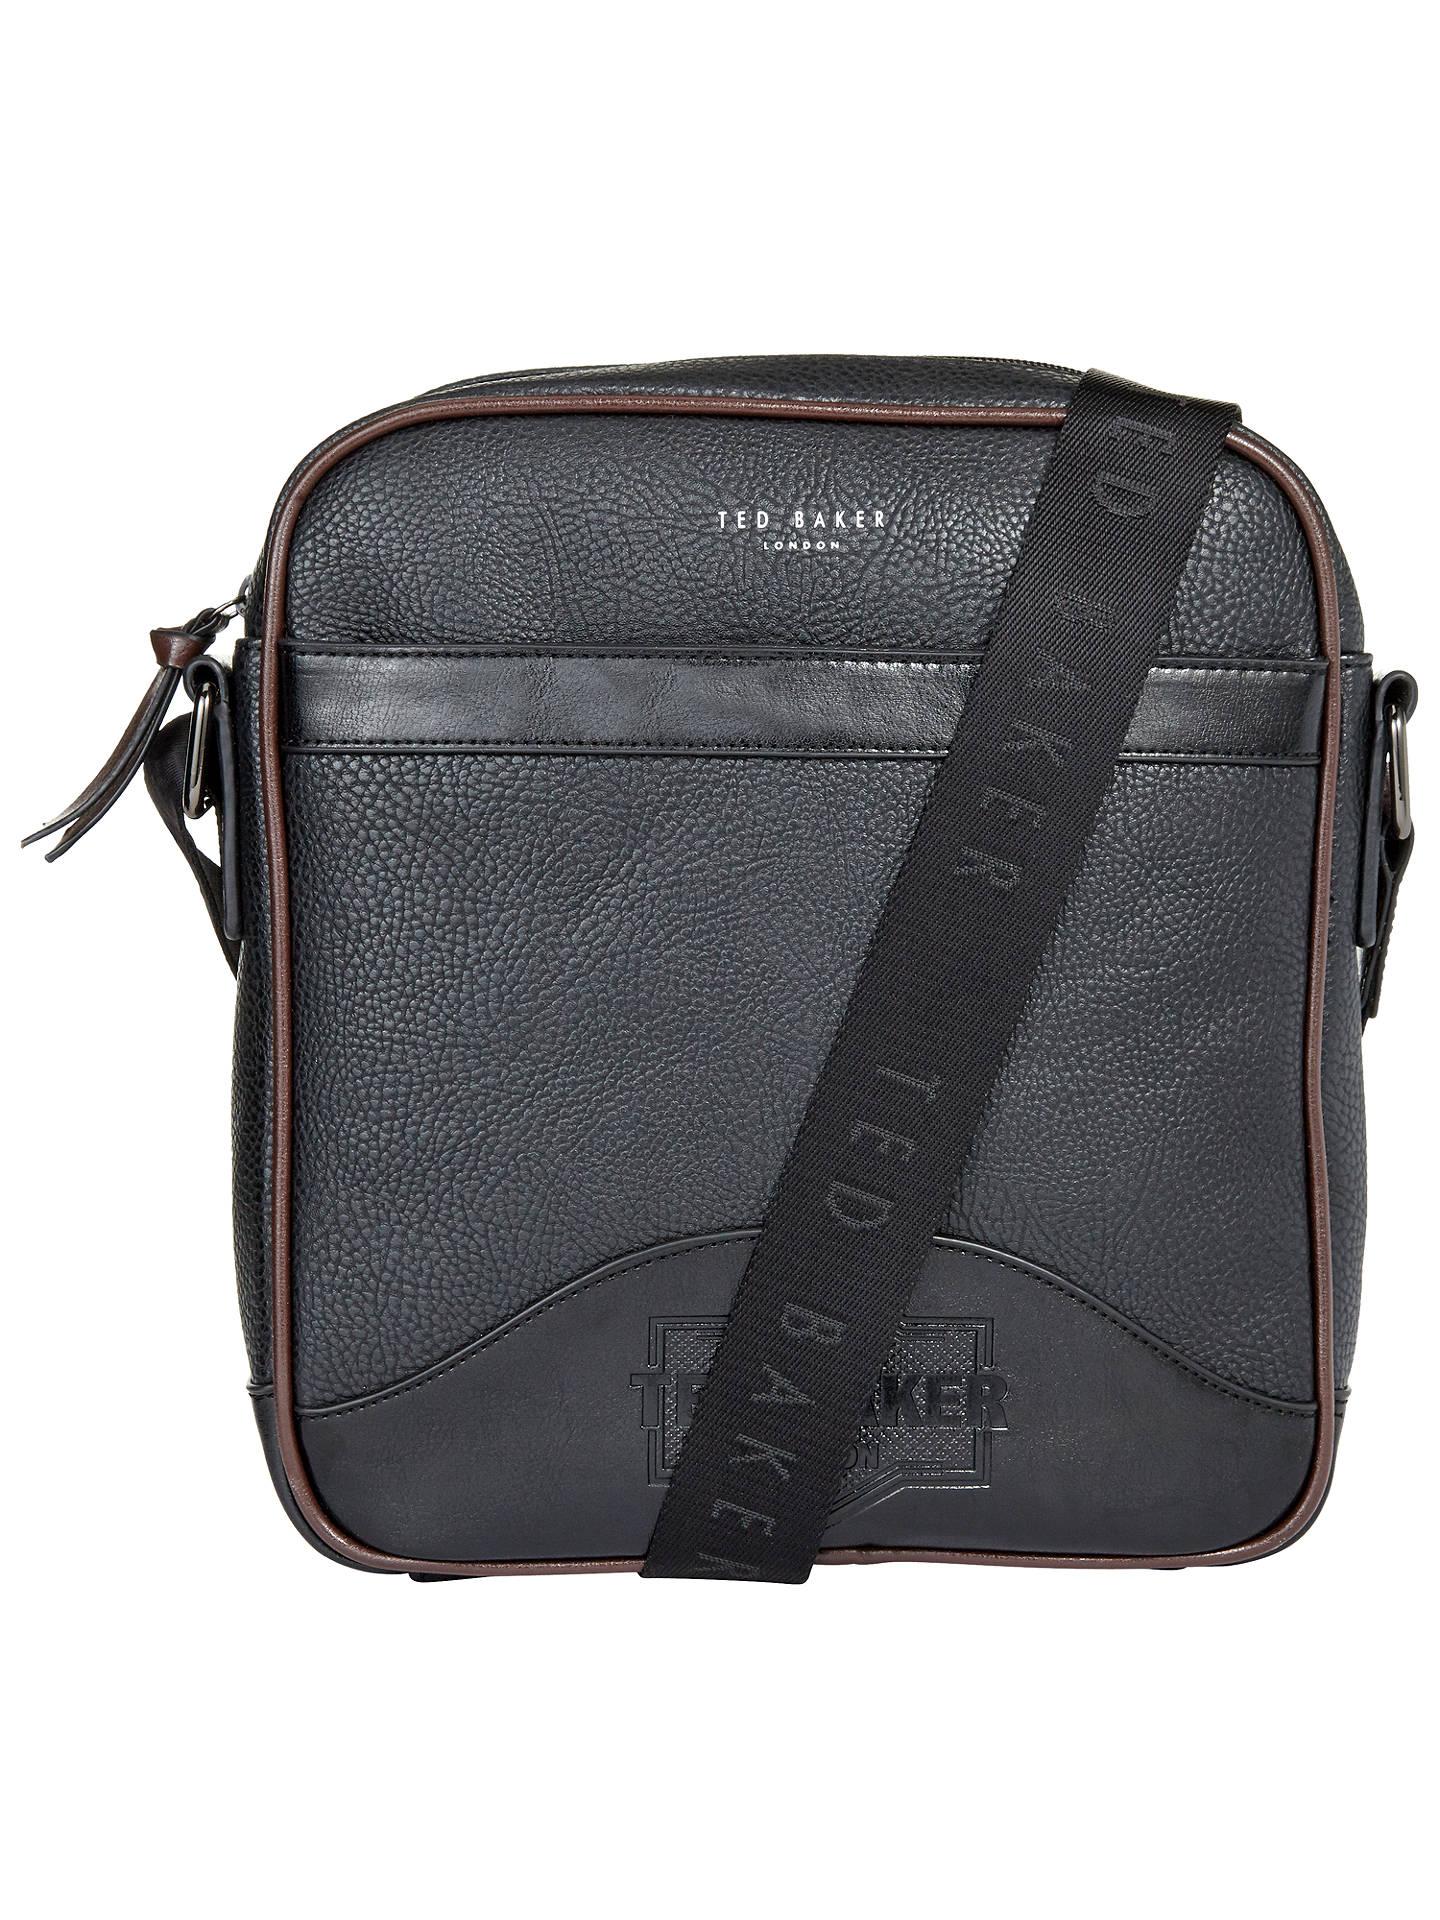 bd354c4fdd07 Buy Ted Baker Isaac Embossed Flight Bag